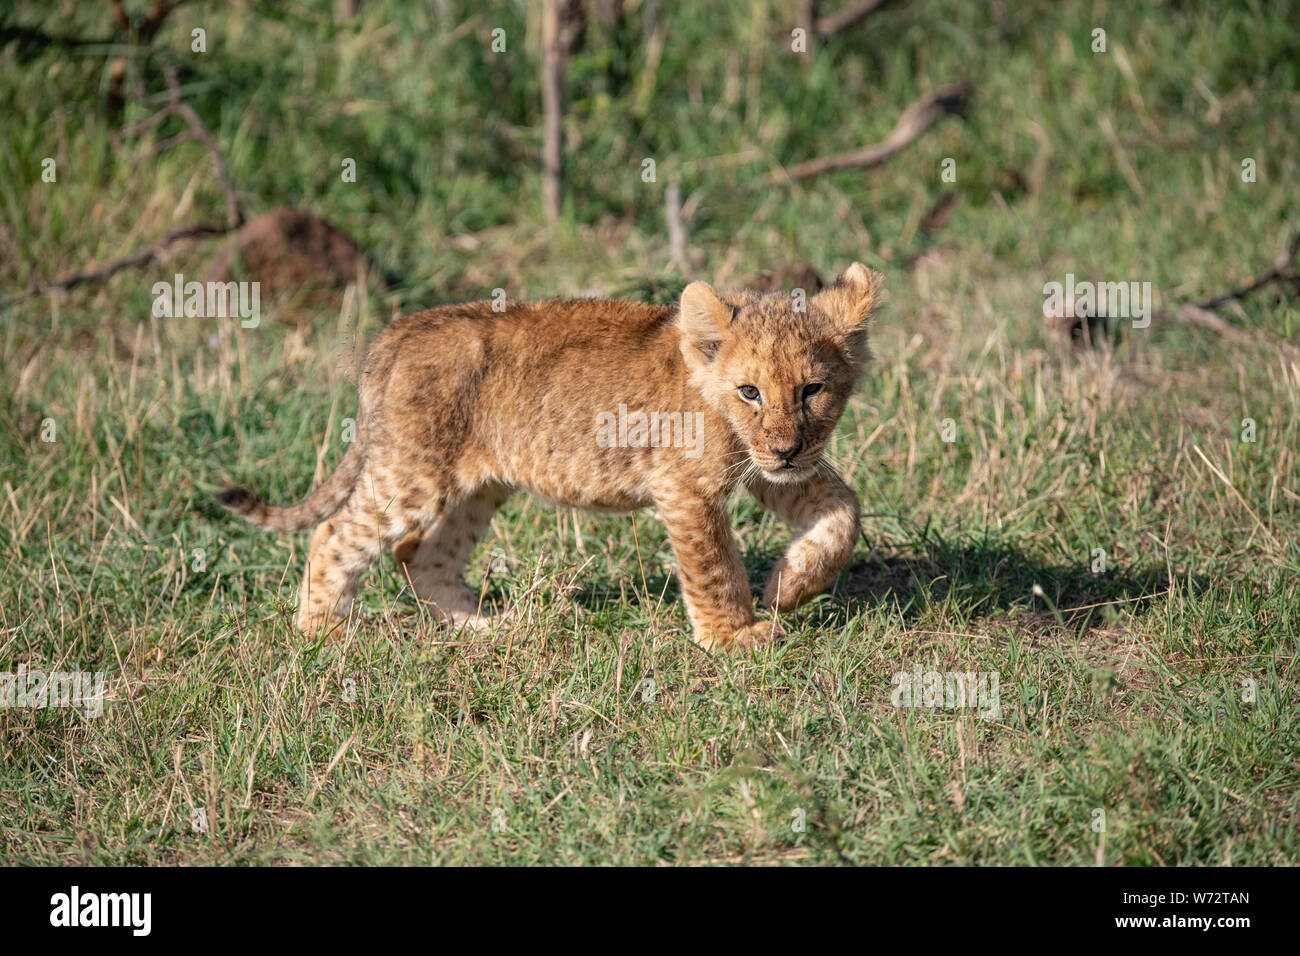 Lion Cub Hunting Stock Photos & Lion Cub Hunting Stock